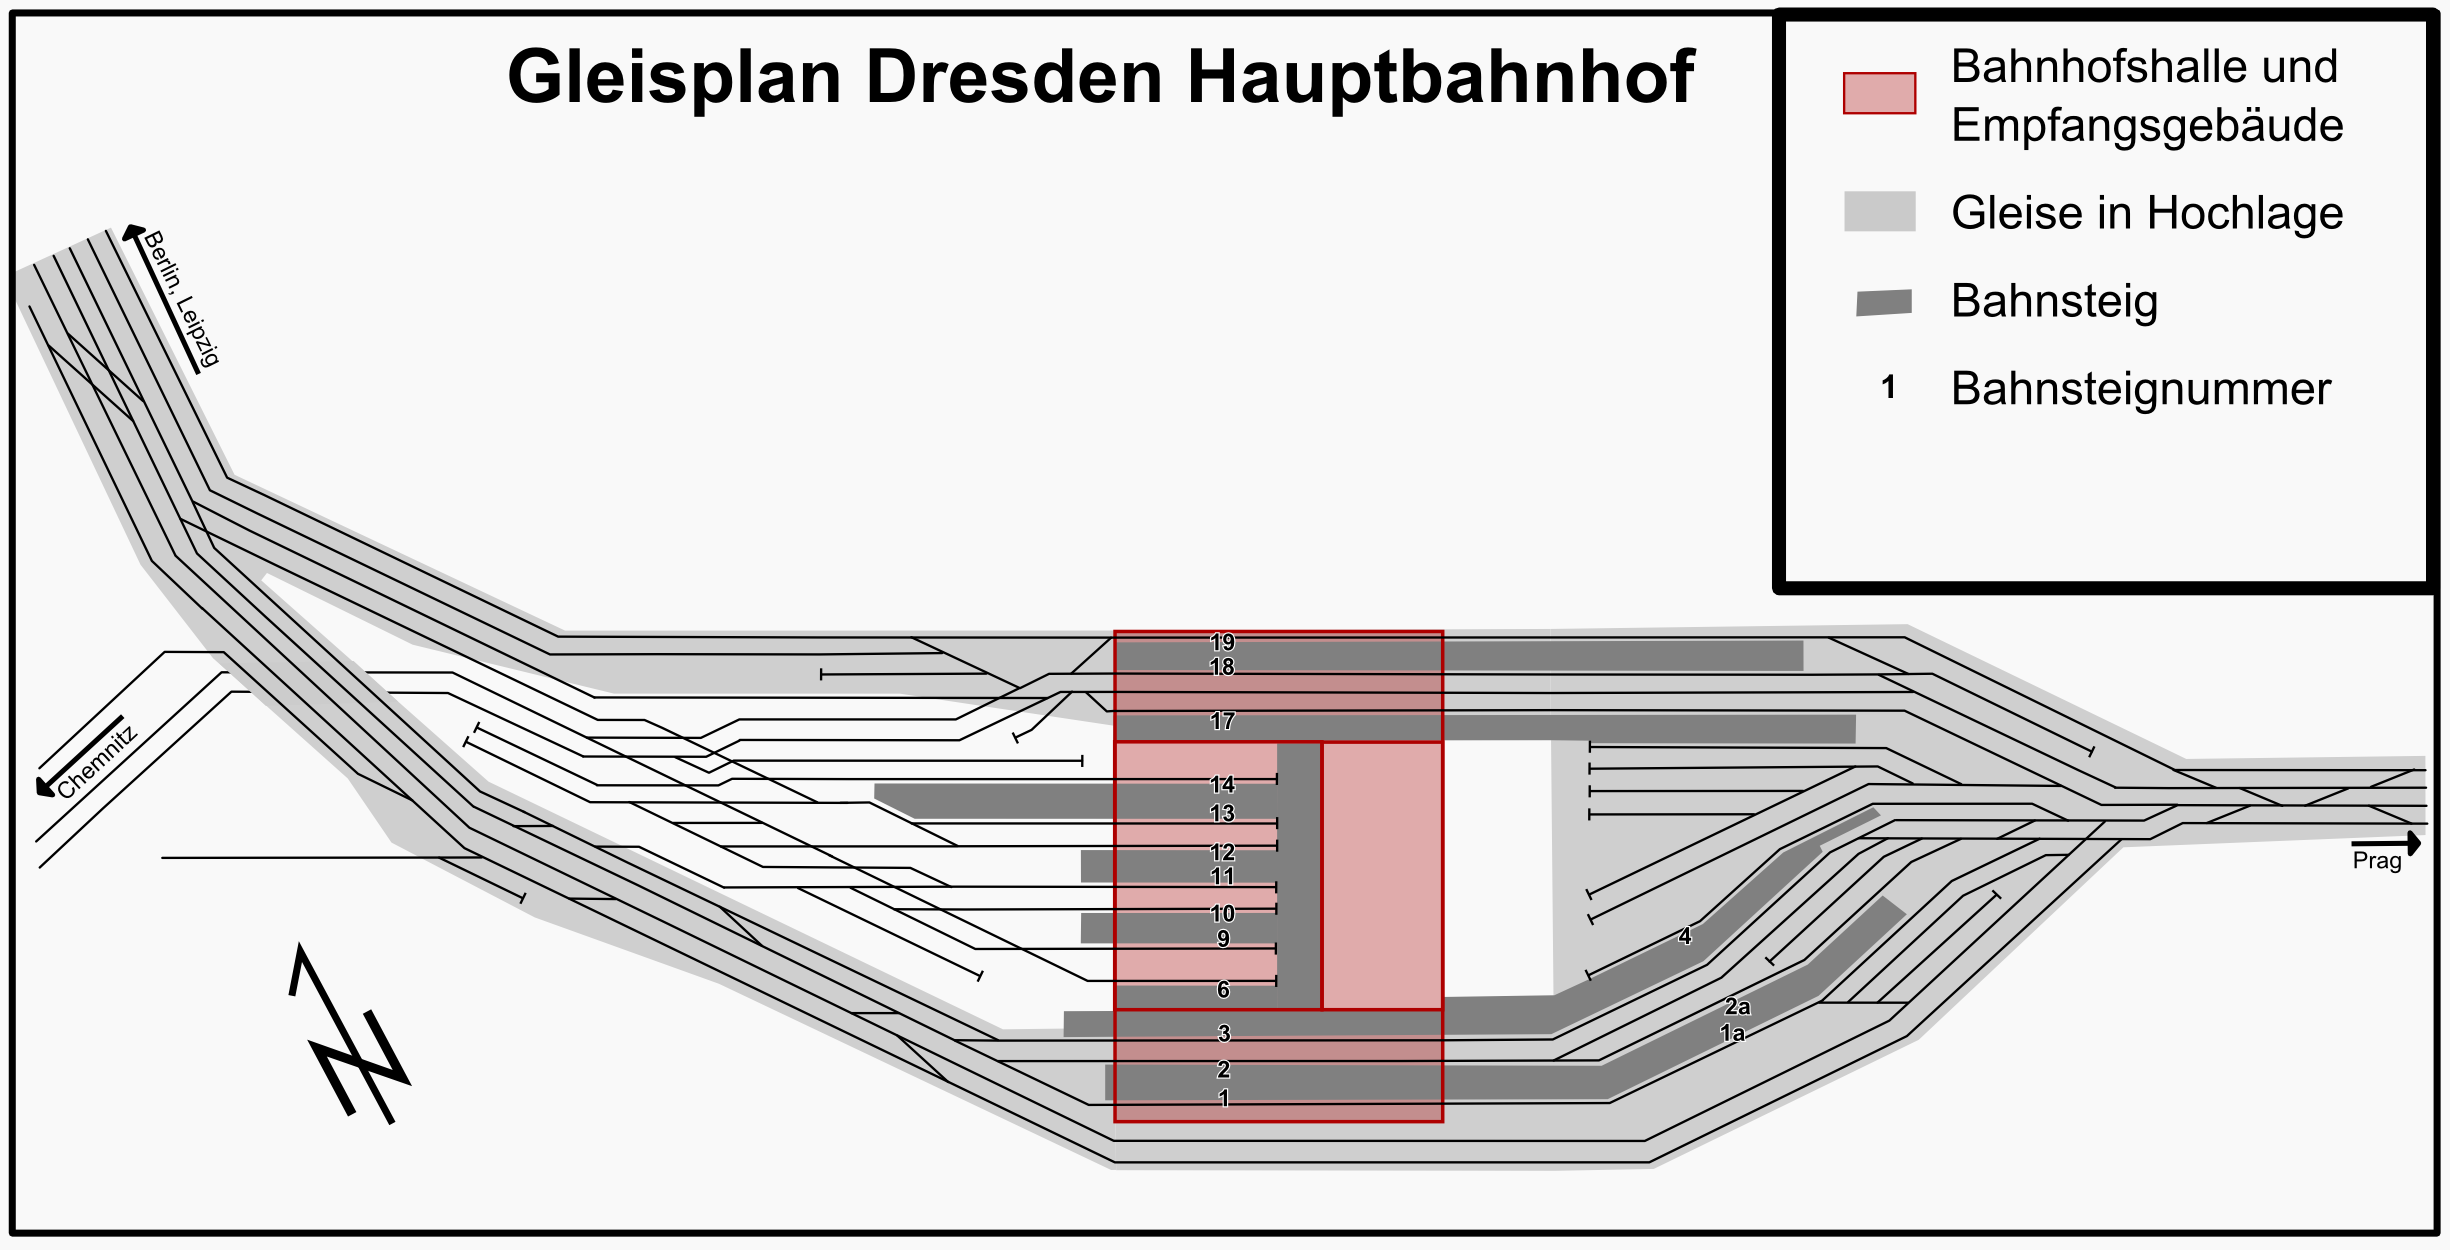 FileDD Hbf Gleisplanpng Wikimedia Commons